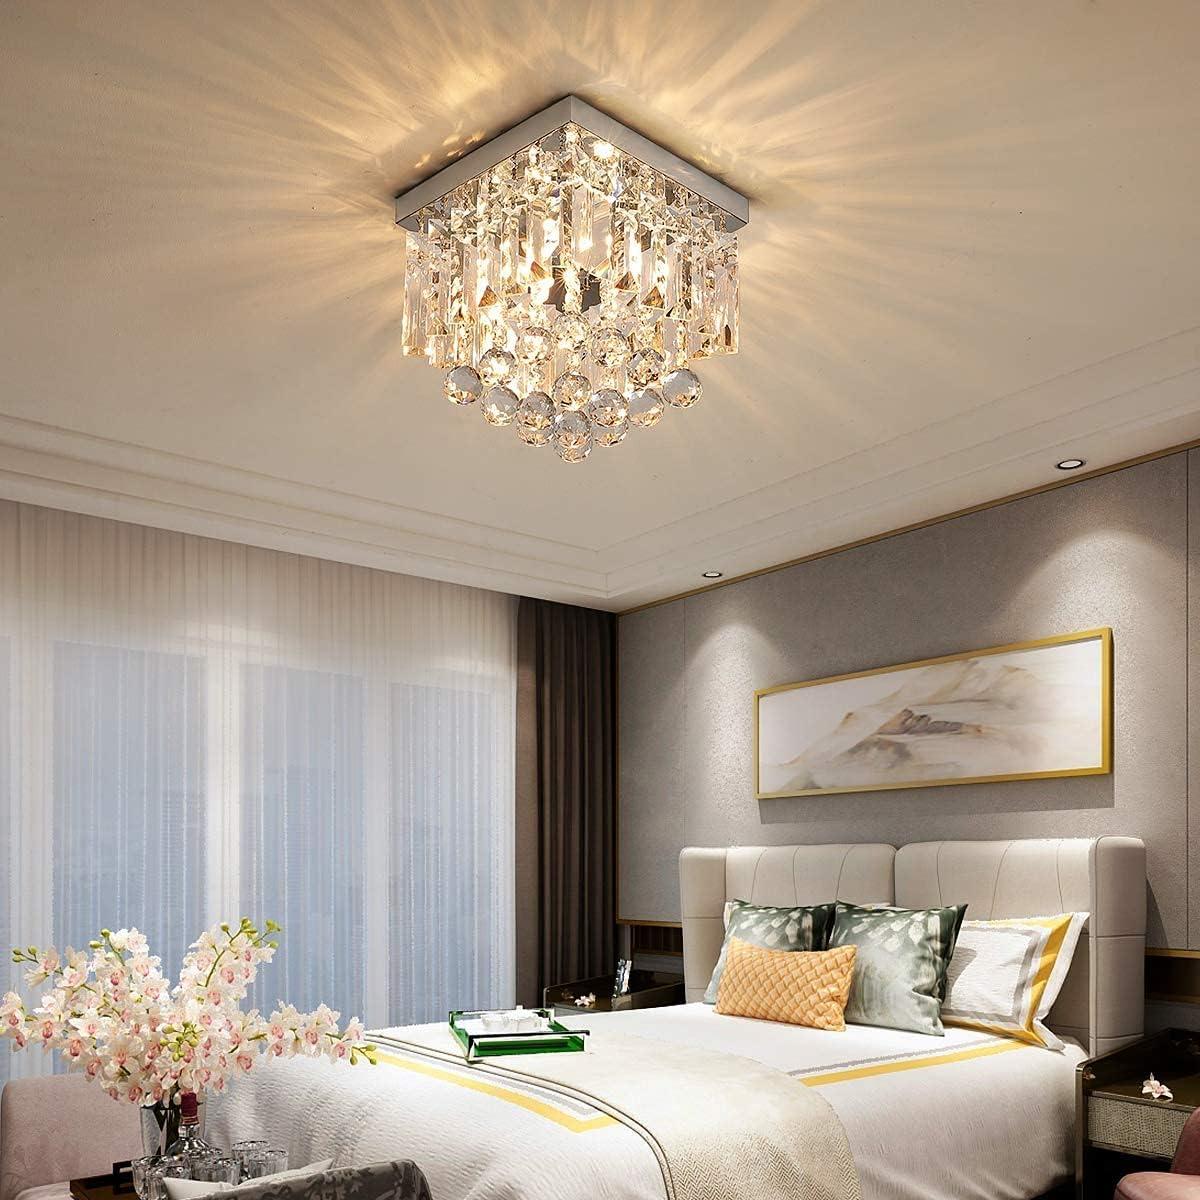 AIGU Crystal Ceiling Light Modern Flush fixtures Mount for Max Regular dealer 81% OFF